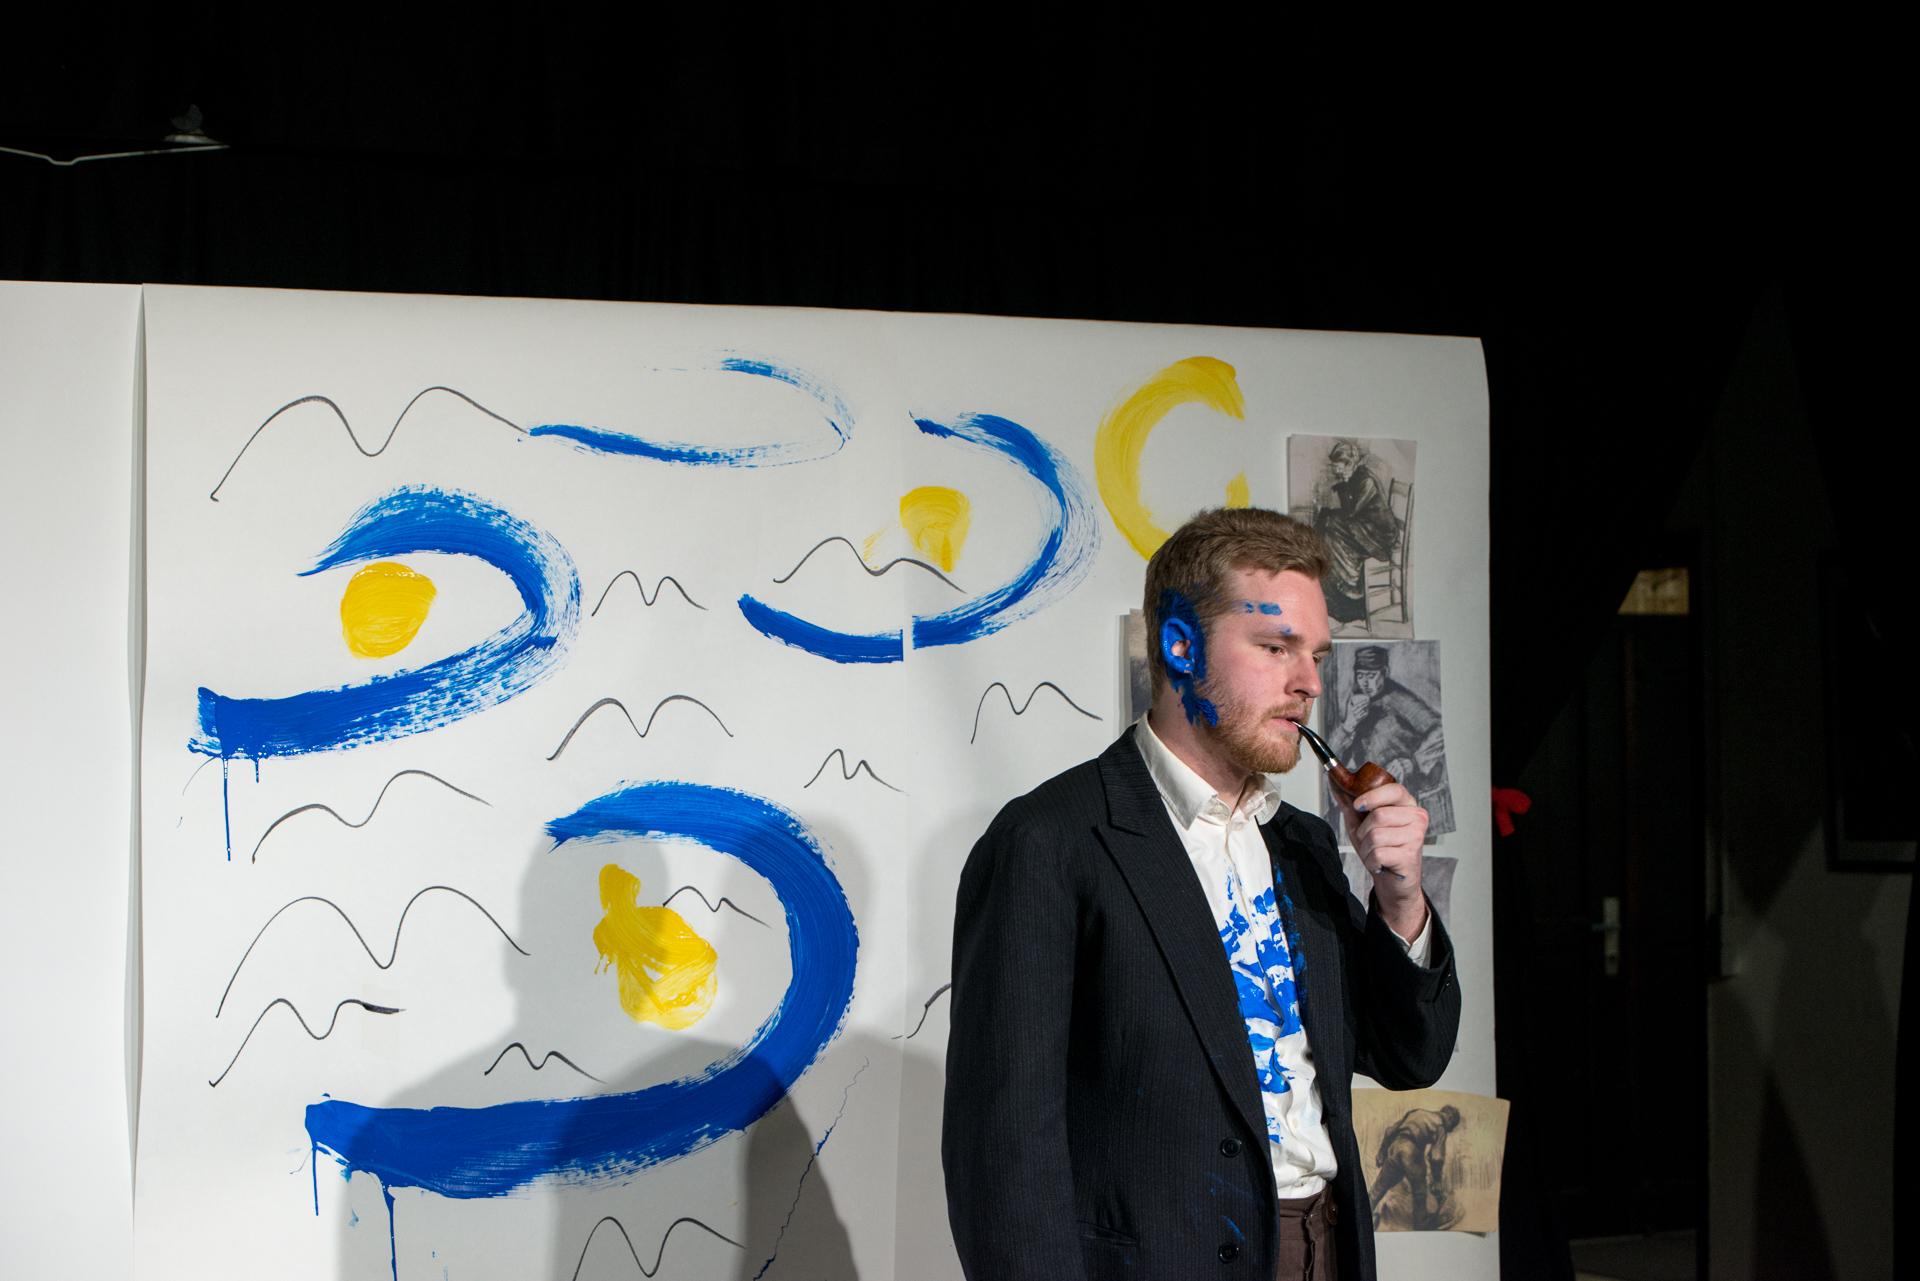 2018: Vincent in Vincent van Gogh